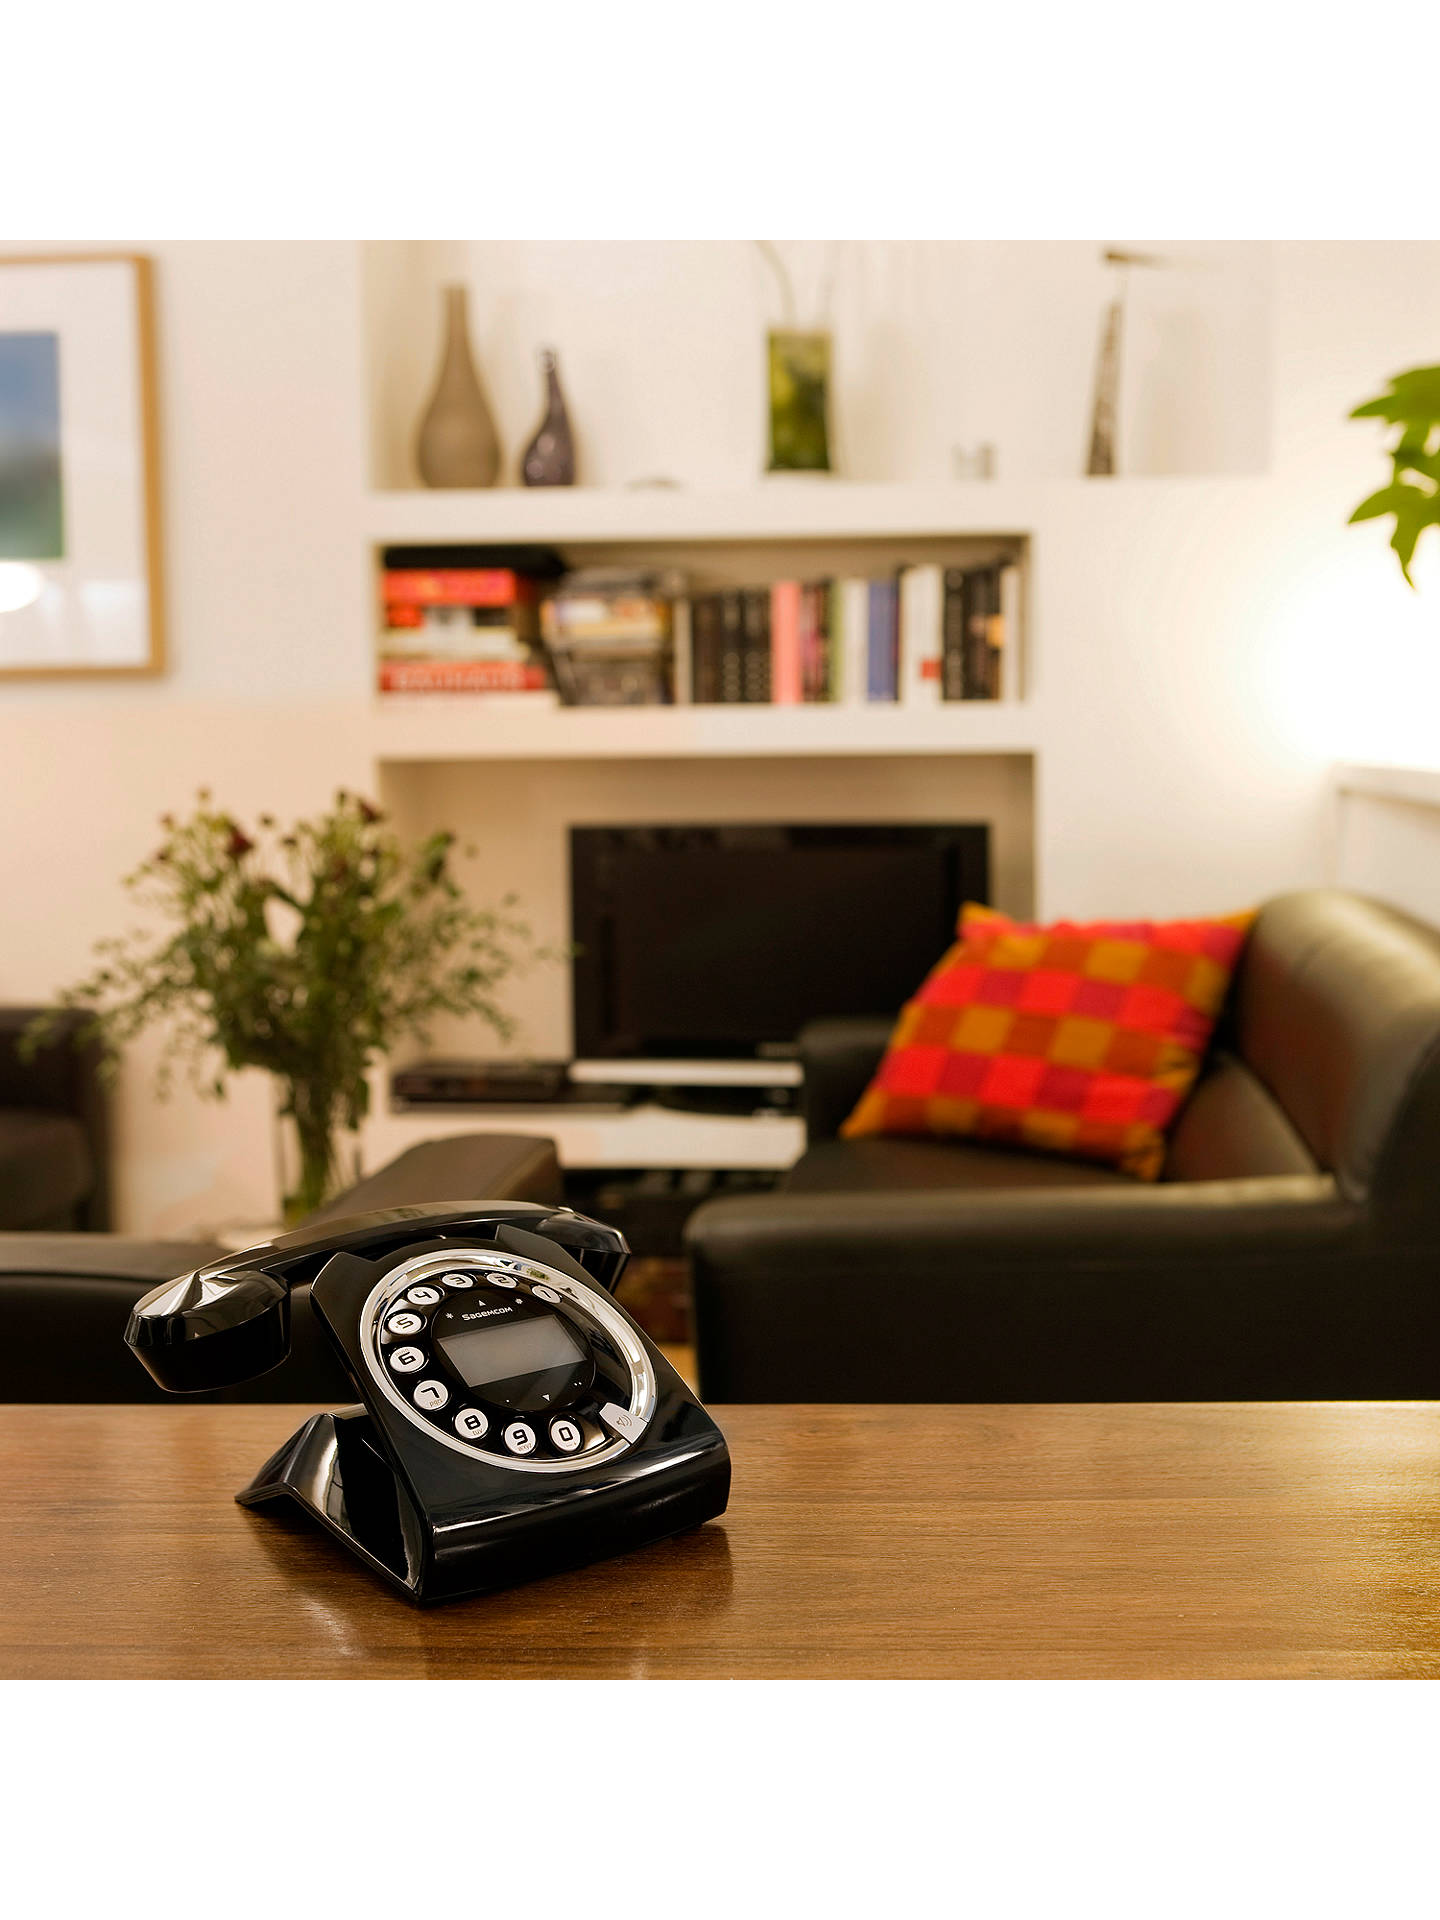 Sagemcom Sixty Cordless Telephone and Answer Machine at John